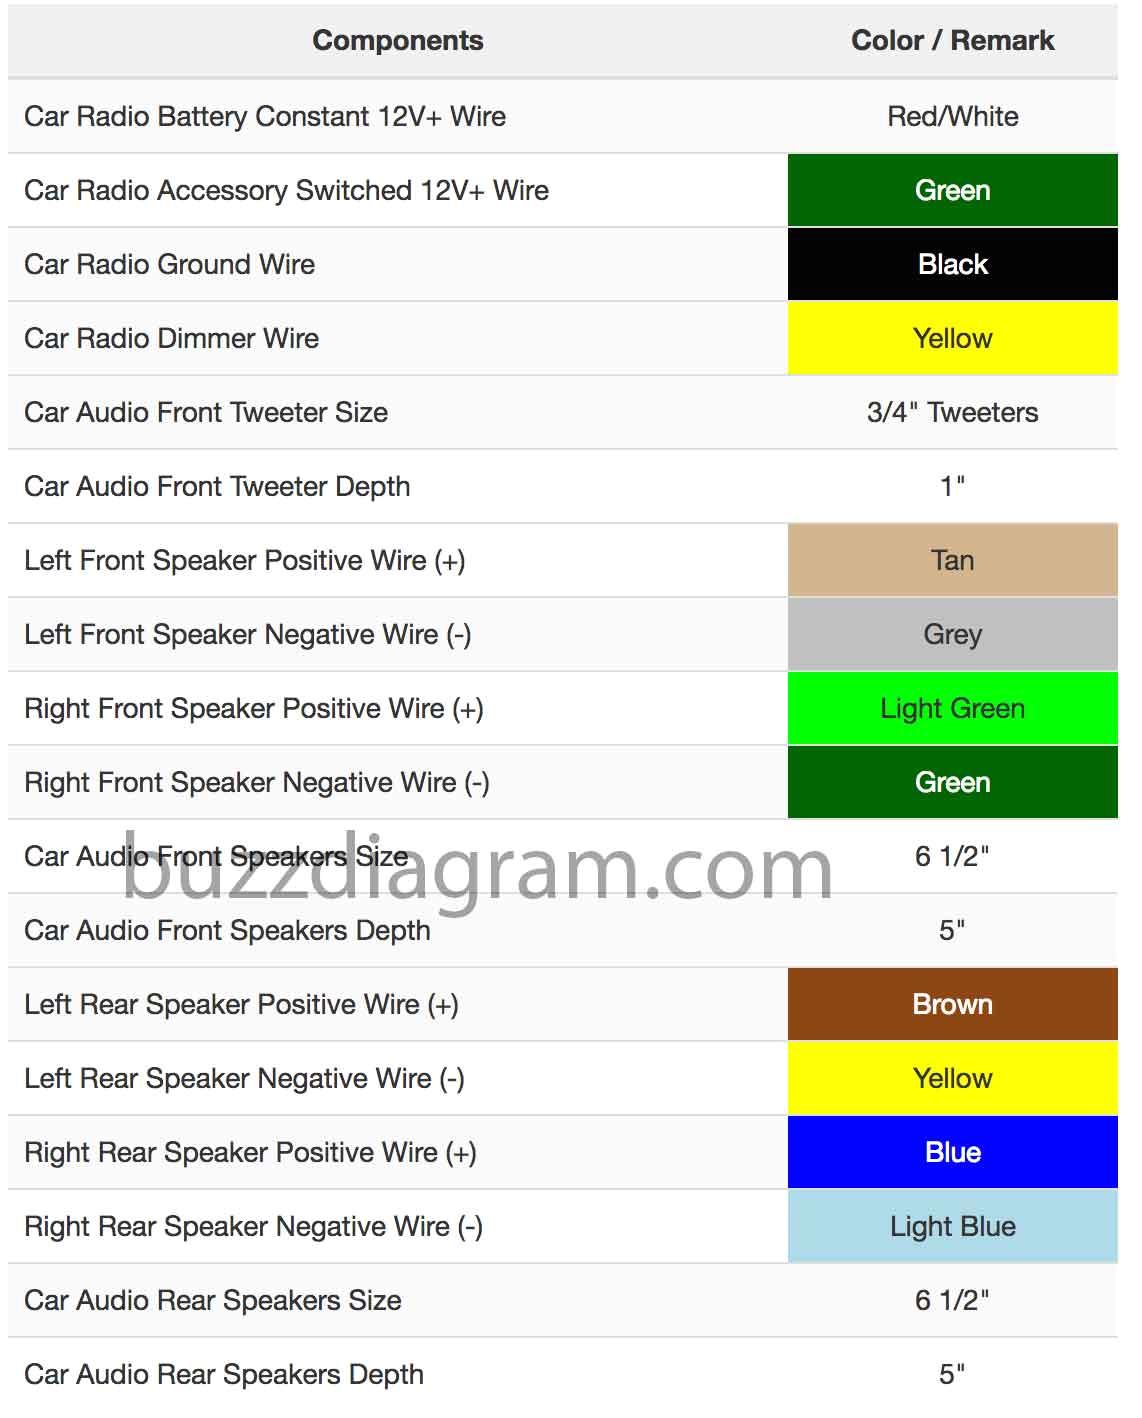 2005 Gmc Sierra Stereo Wiring Diagram Wiring Gmc Diagram Radio 97yokon Wiring Diagram Used